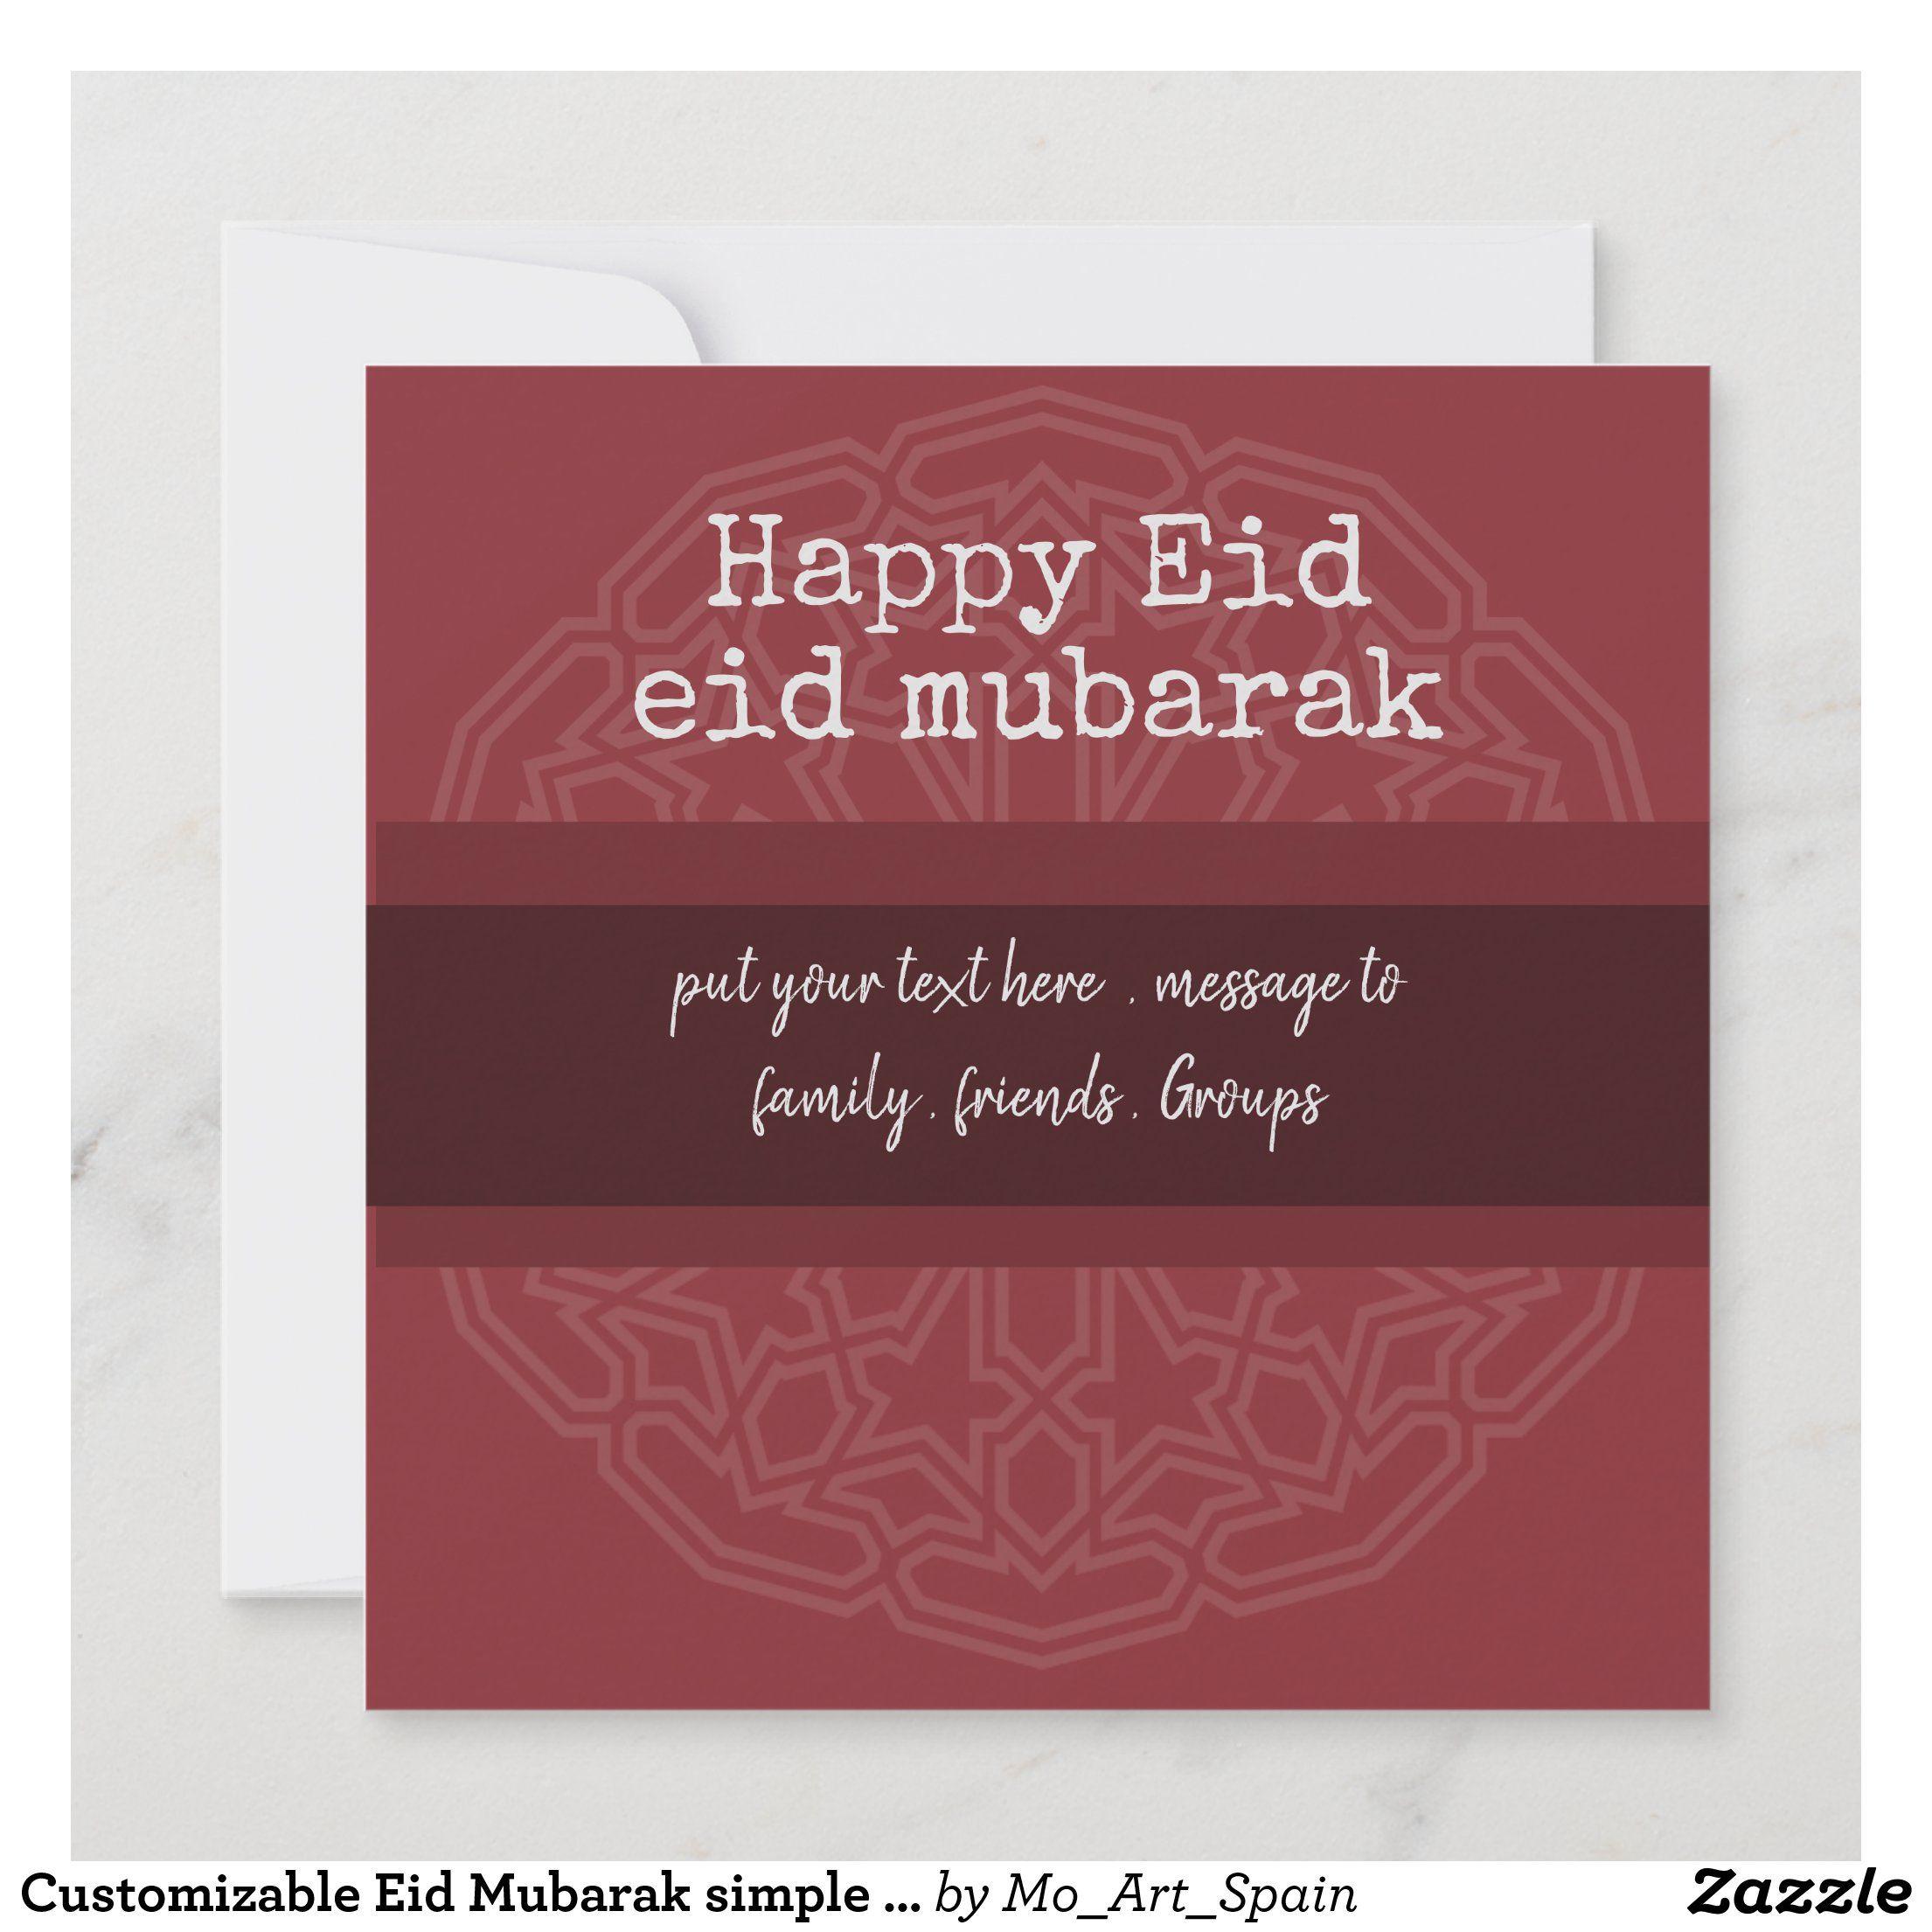 customizable eid mubarak decorative greeting holiday card